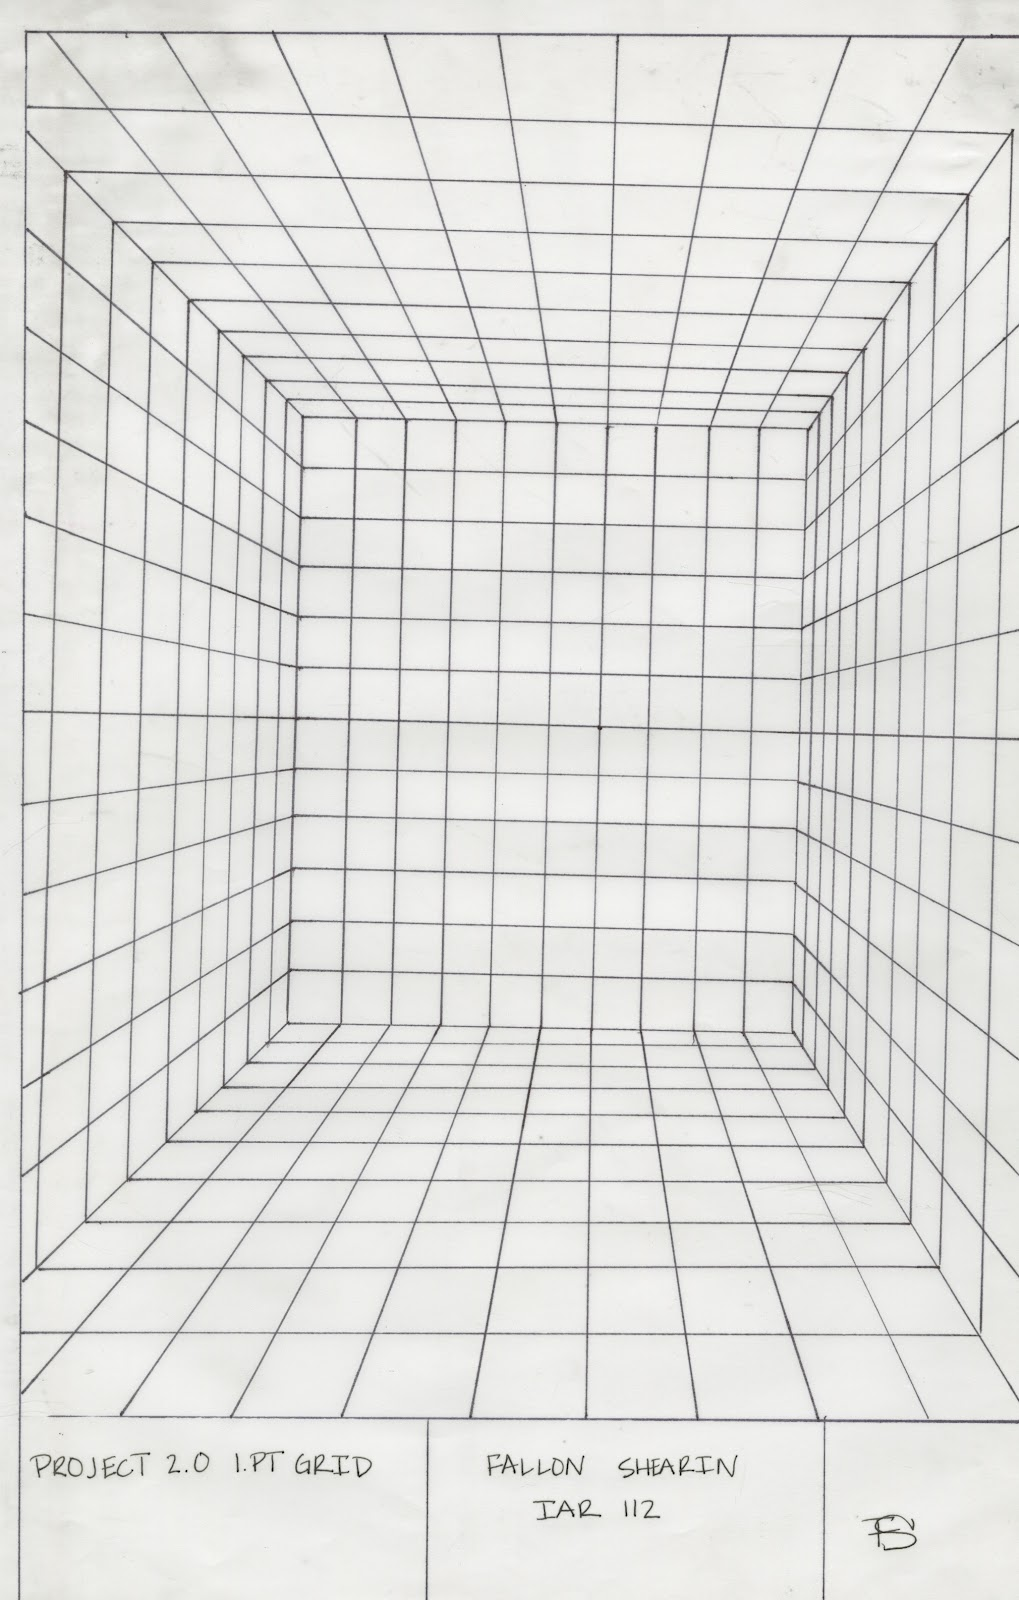 Fallon Shearin Design Project 2 0 Perspective Grid